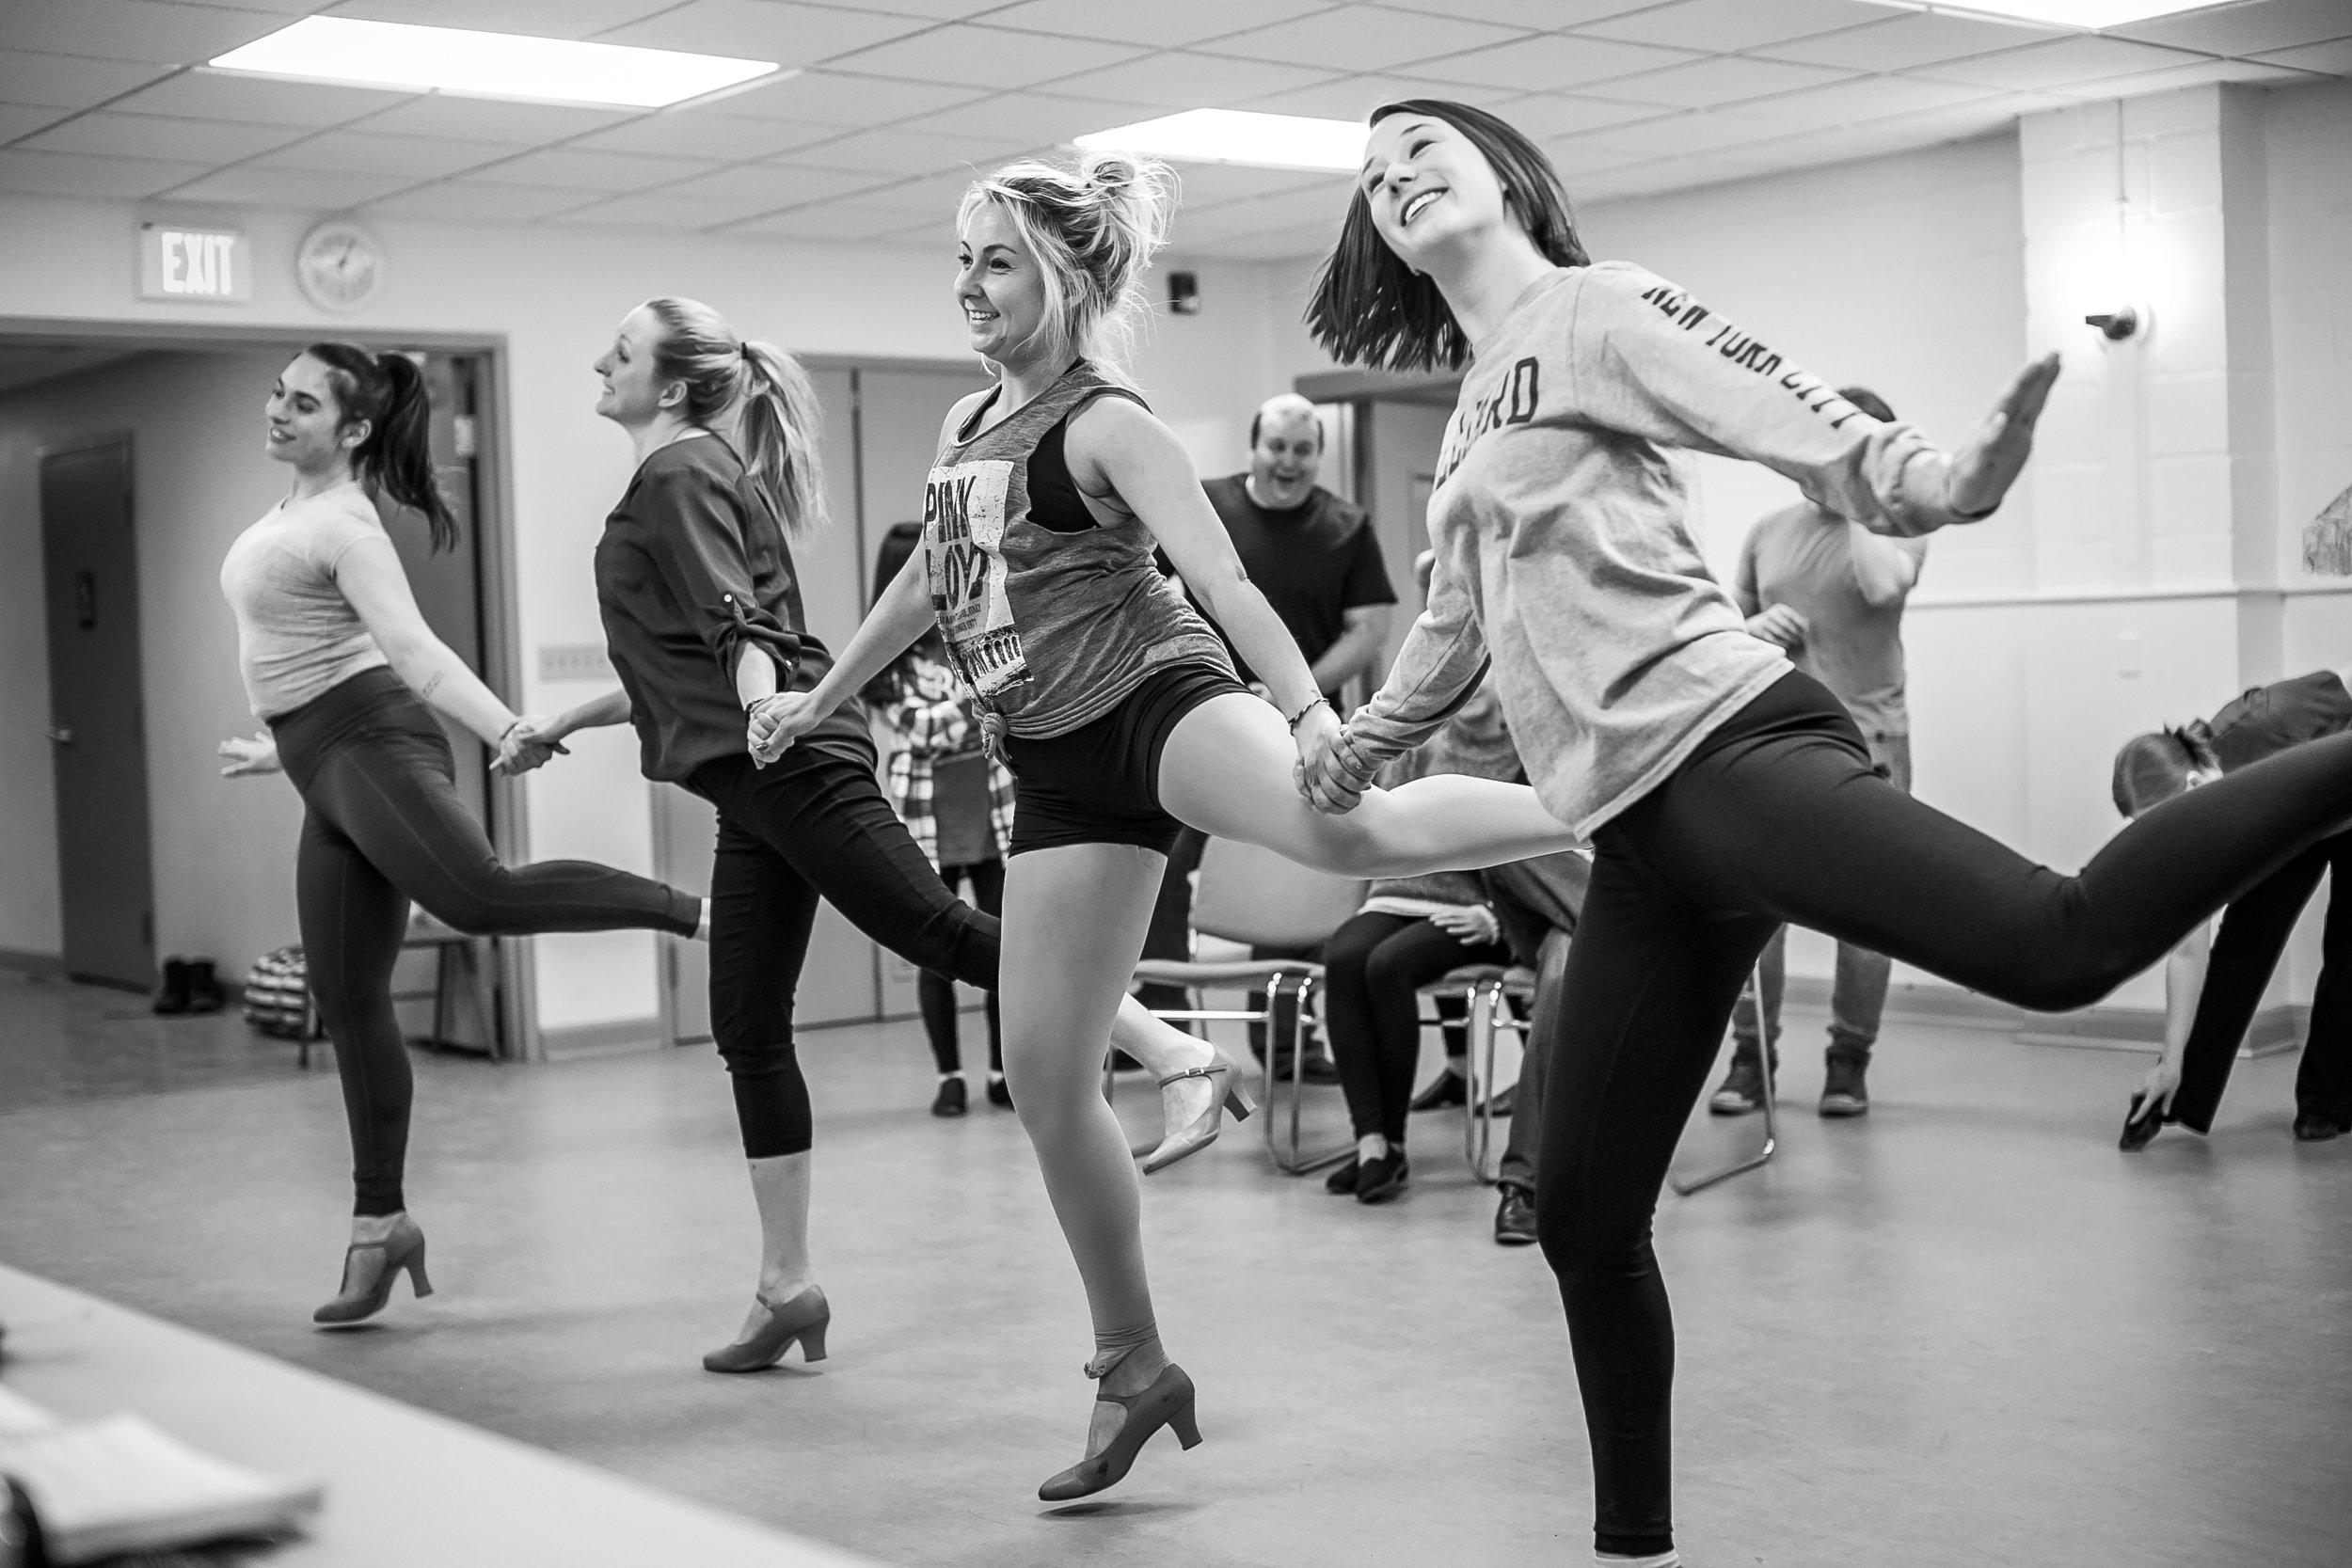 newmarket-toronto-theatre-rehearsal-musical-31.jpg